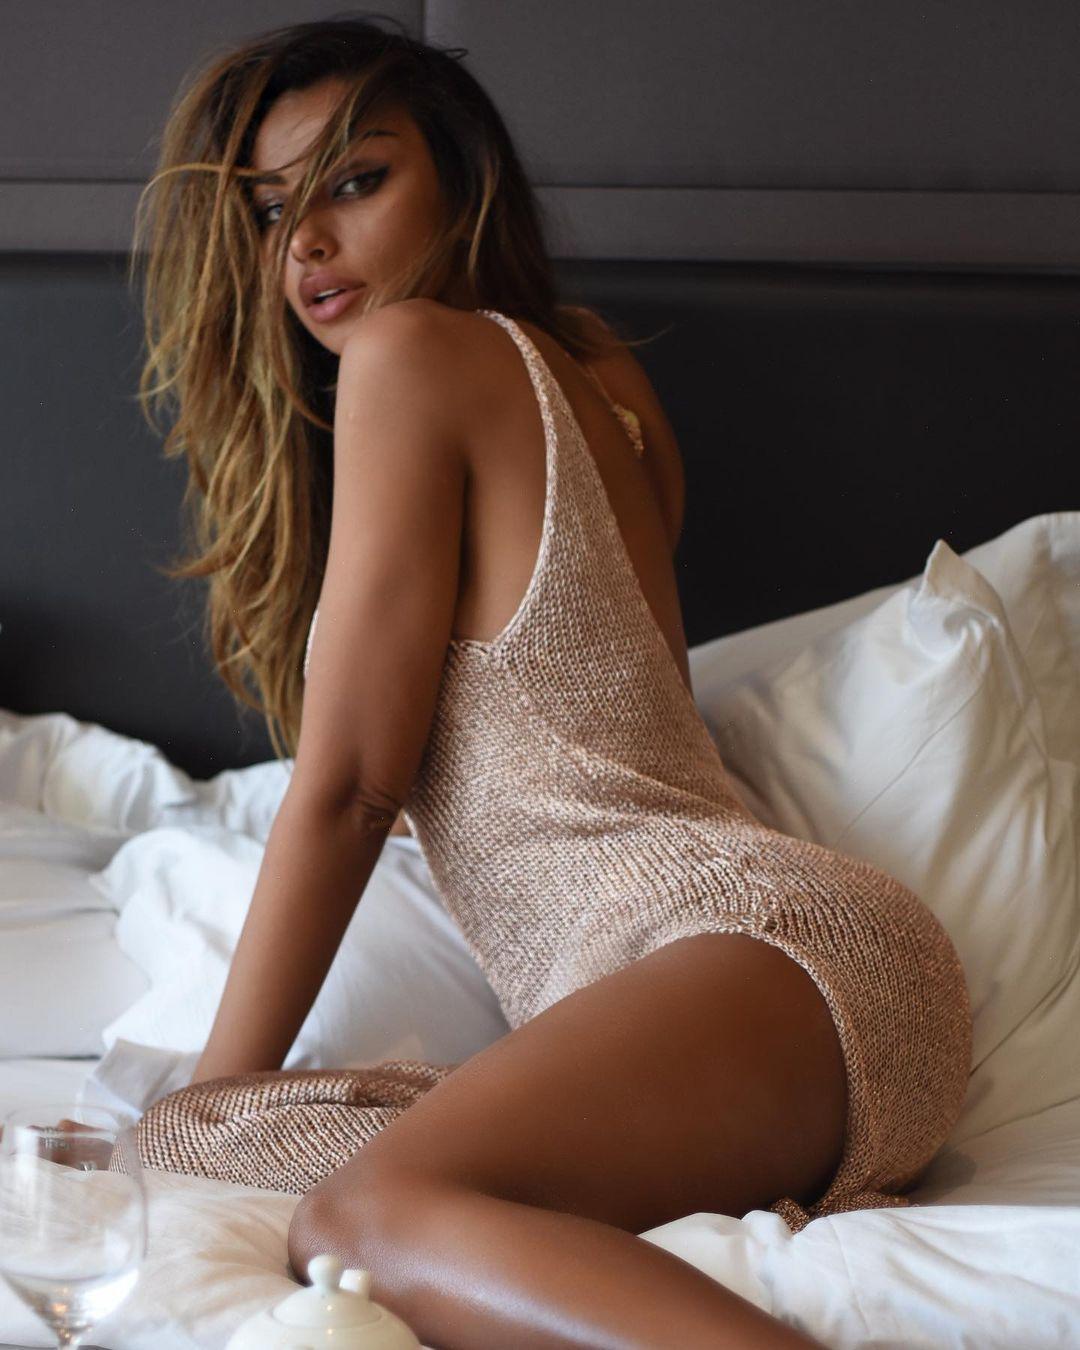 Madalina Diana Ghenea Stunning Boobs